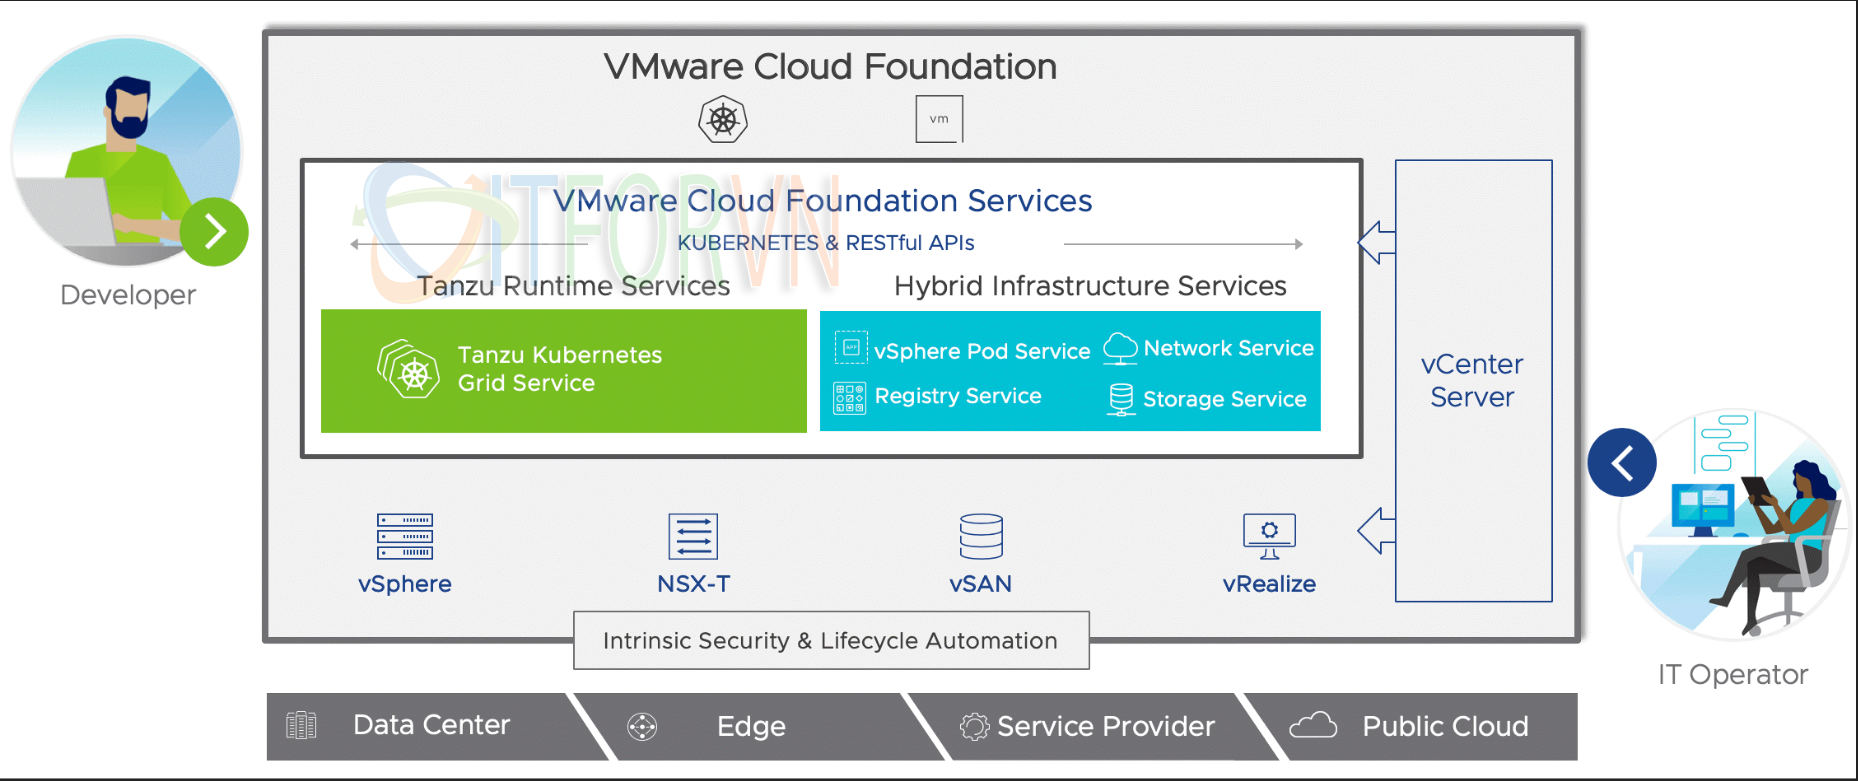 2 2 - VMware vSphere 7: 10 lý do tại sao